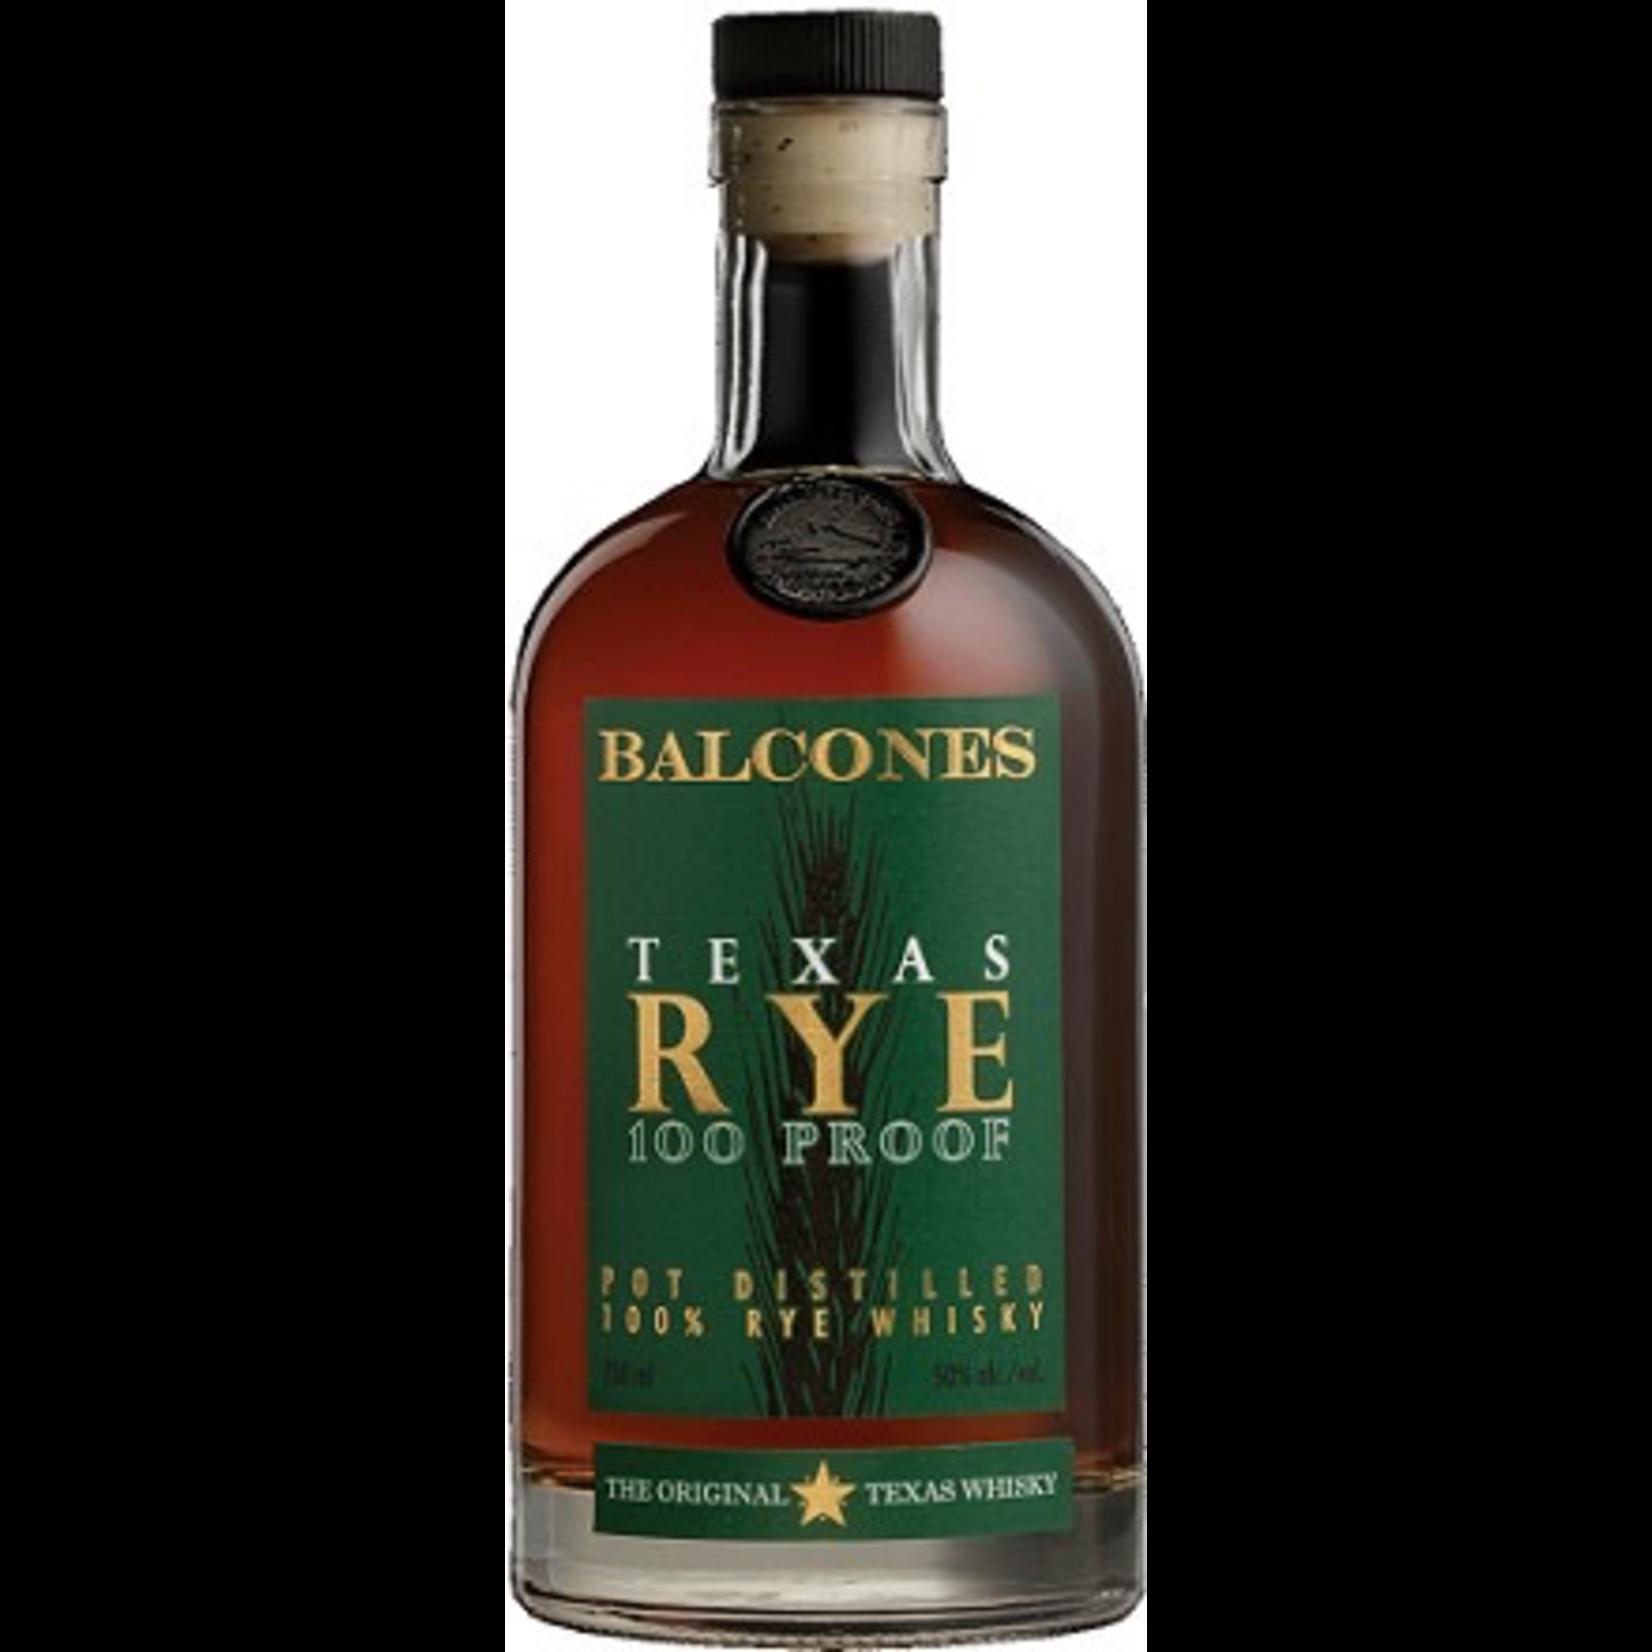 Balcones Whisky Texas Rye 100 Proof